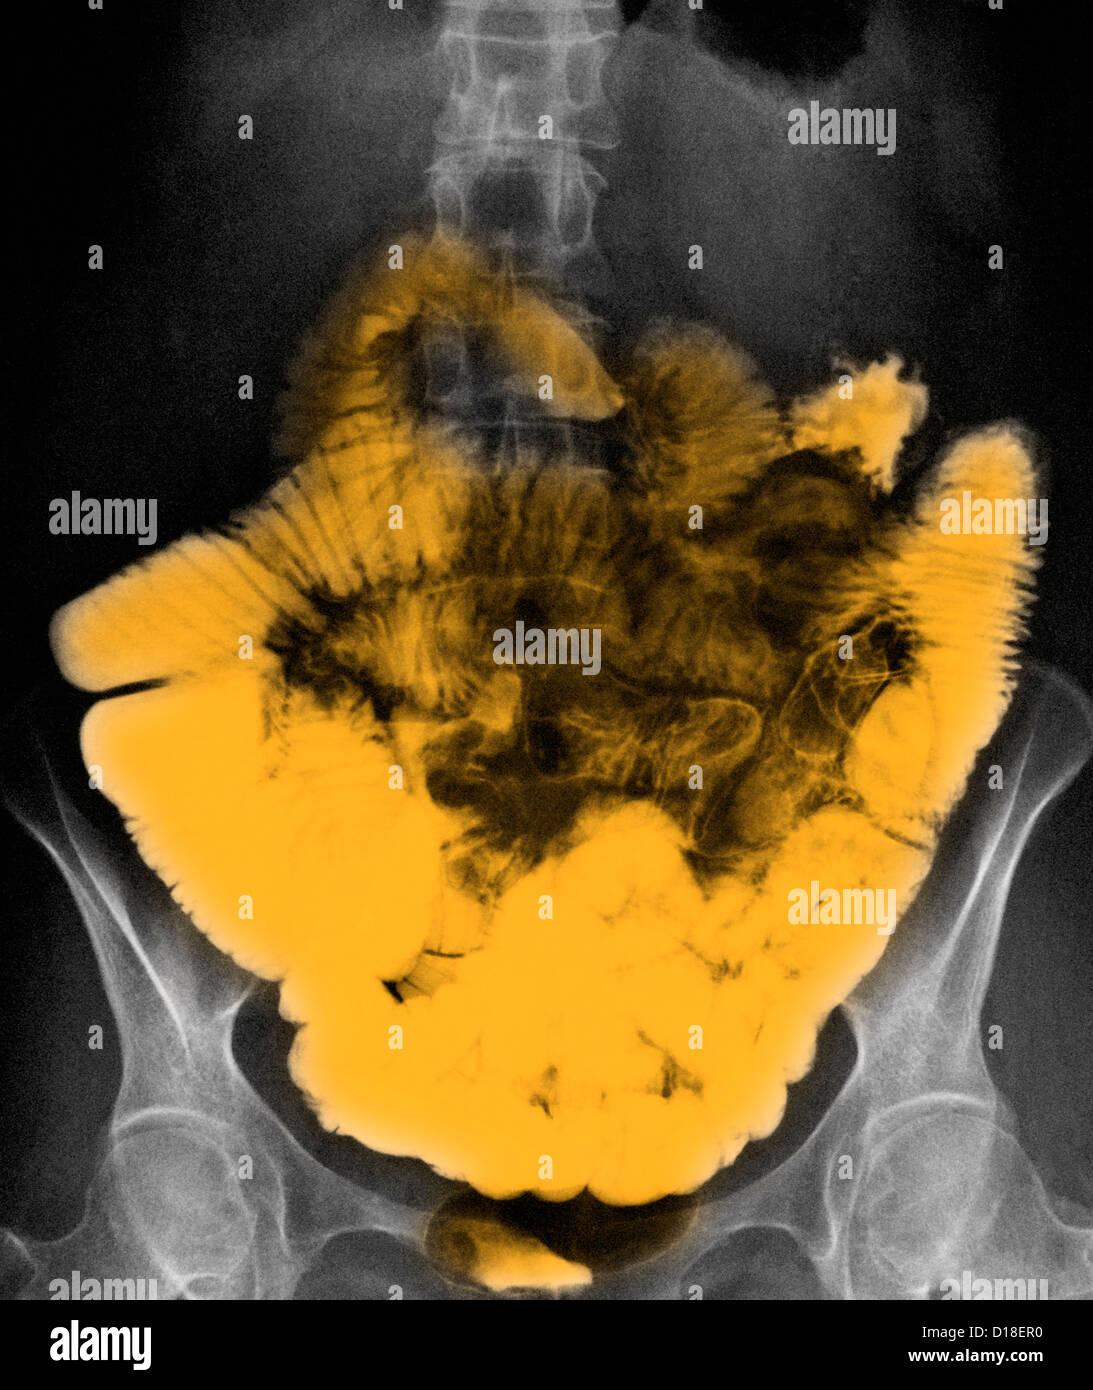 normal small bowel barium contrast abdominal X-ray - Stock Image